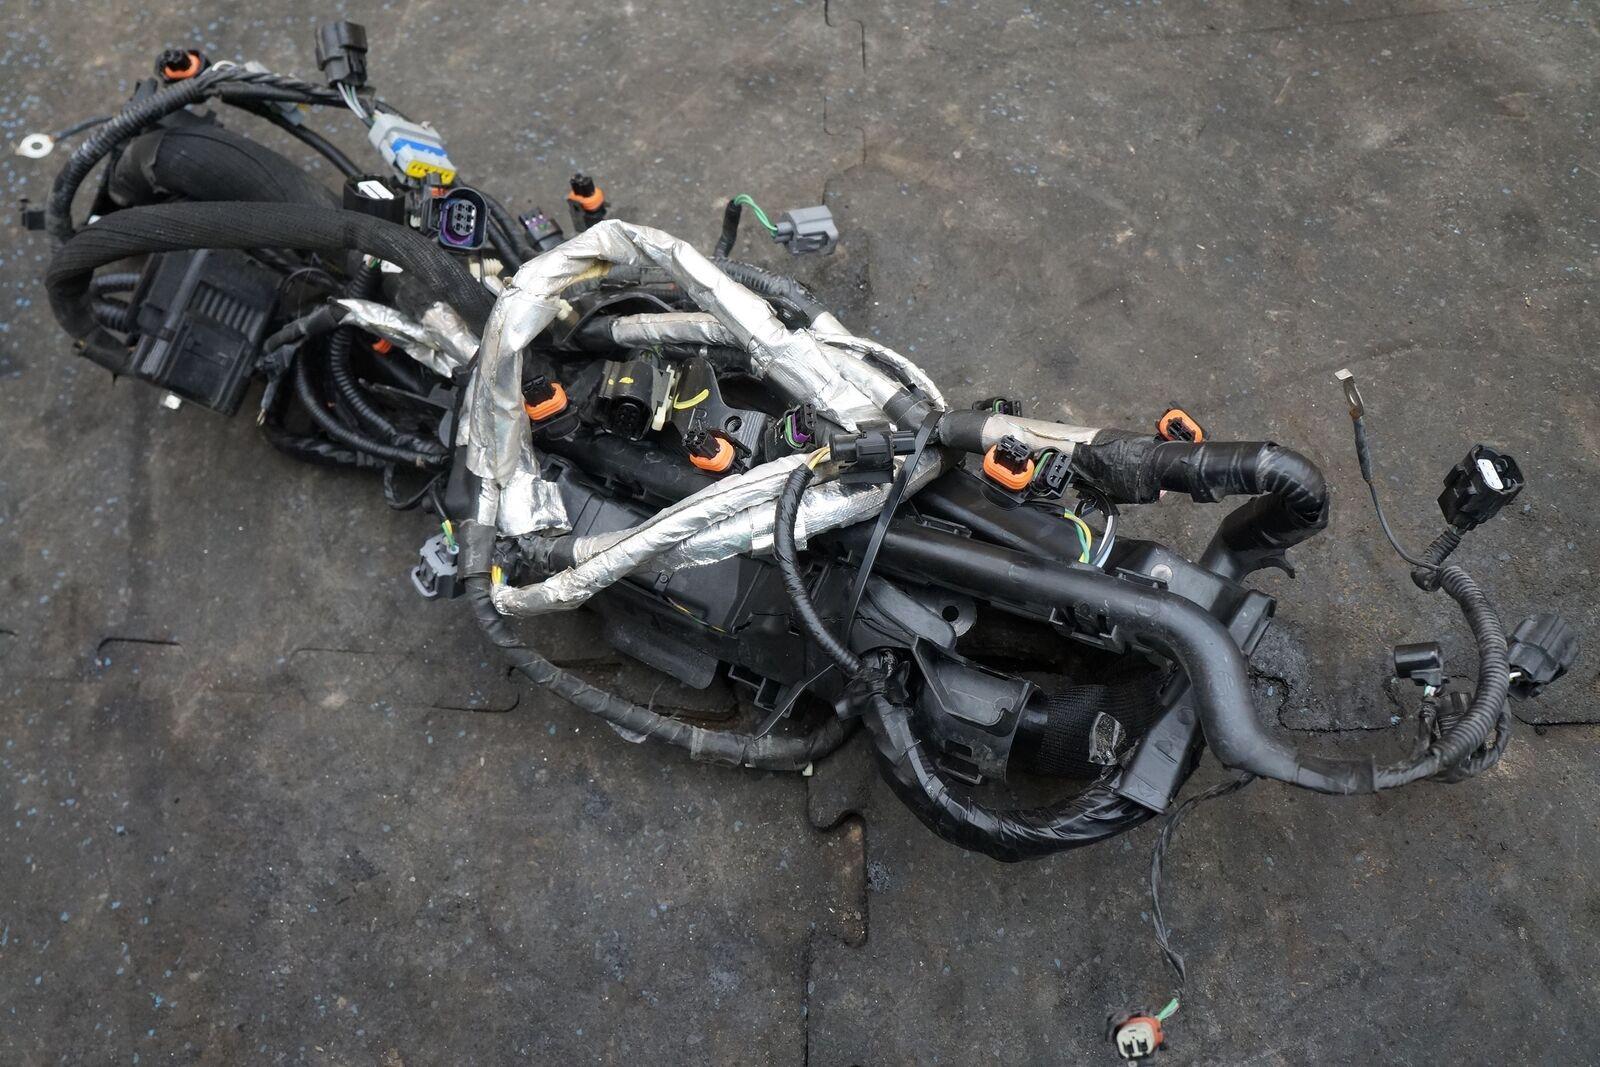 Engine Wiring Wire Harness 50l V8 Sc Lr082644 Oem Range Rover 2014